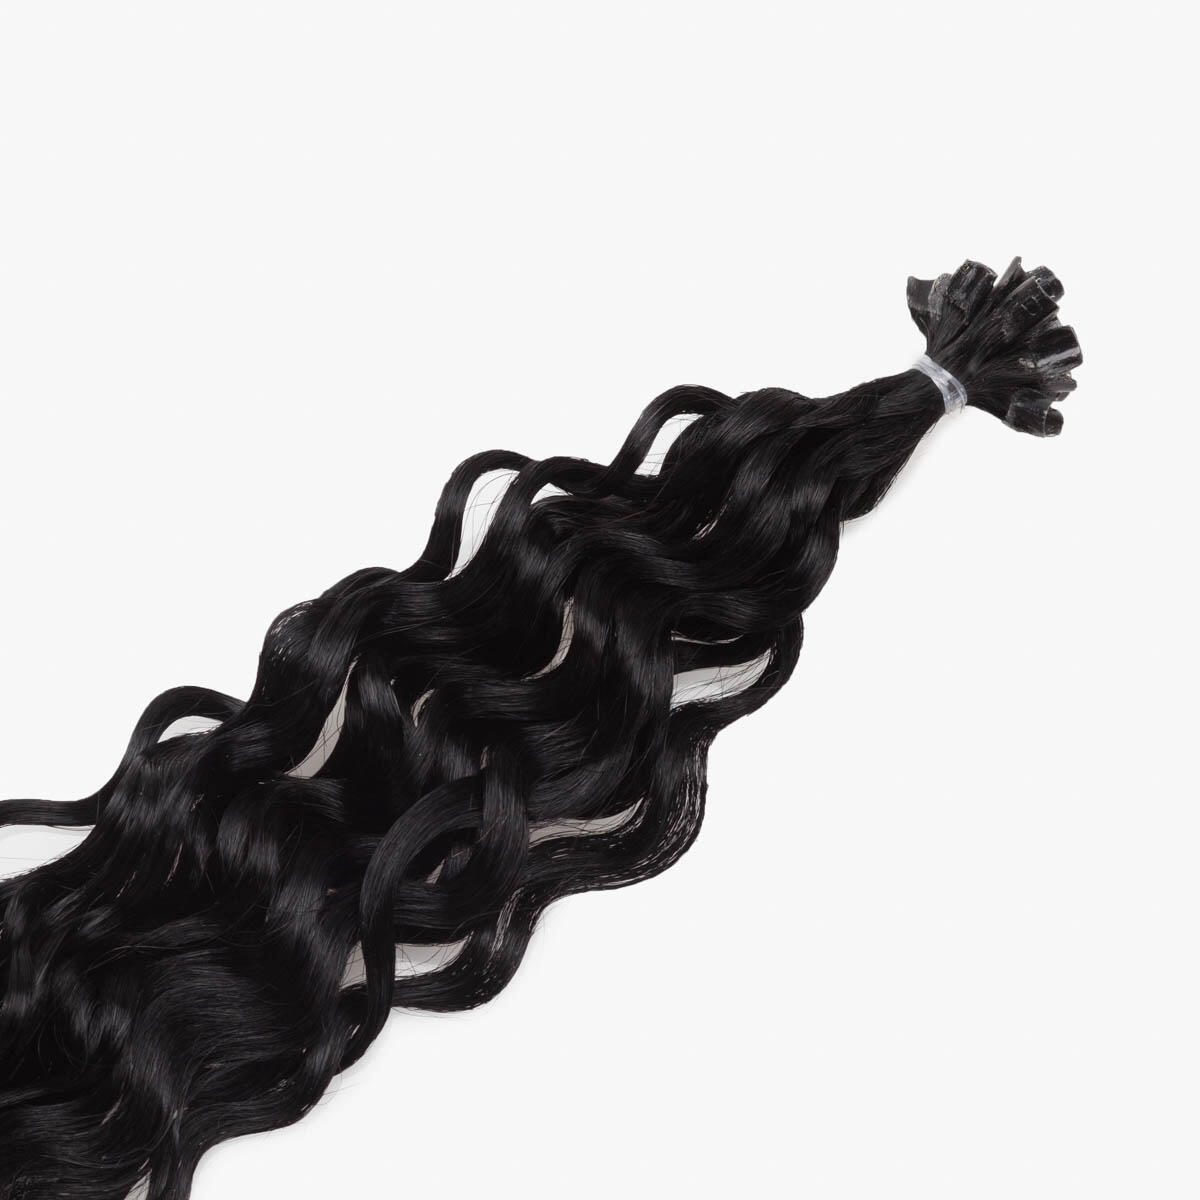 Nail Hair Original Curly 1.0 Black 40 cm